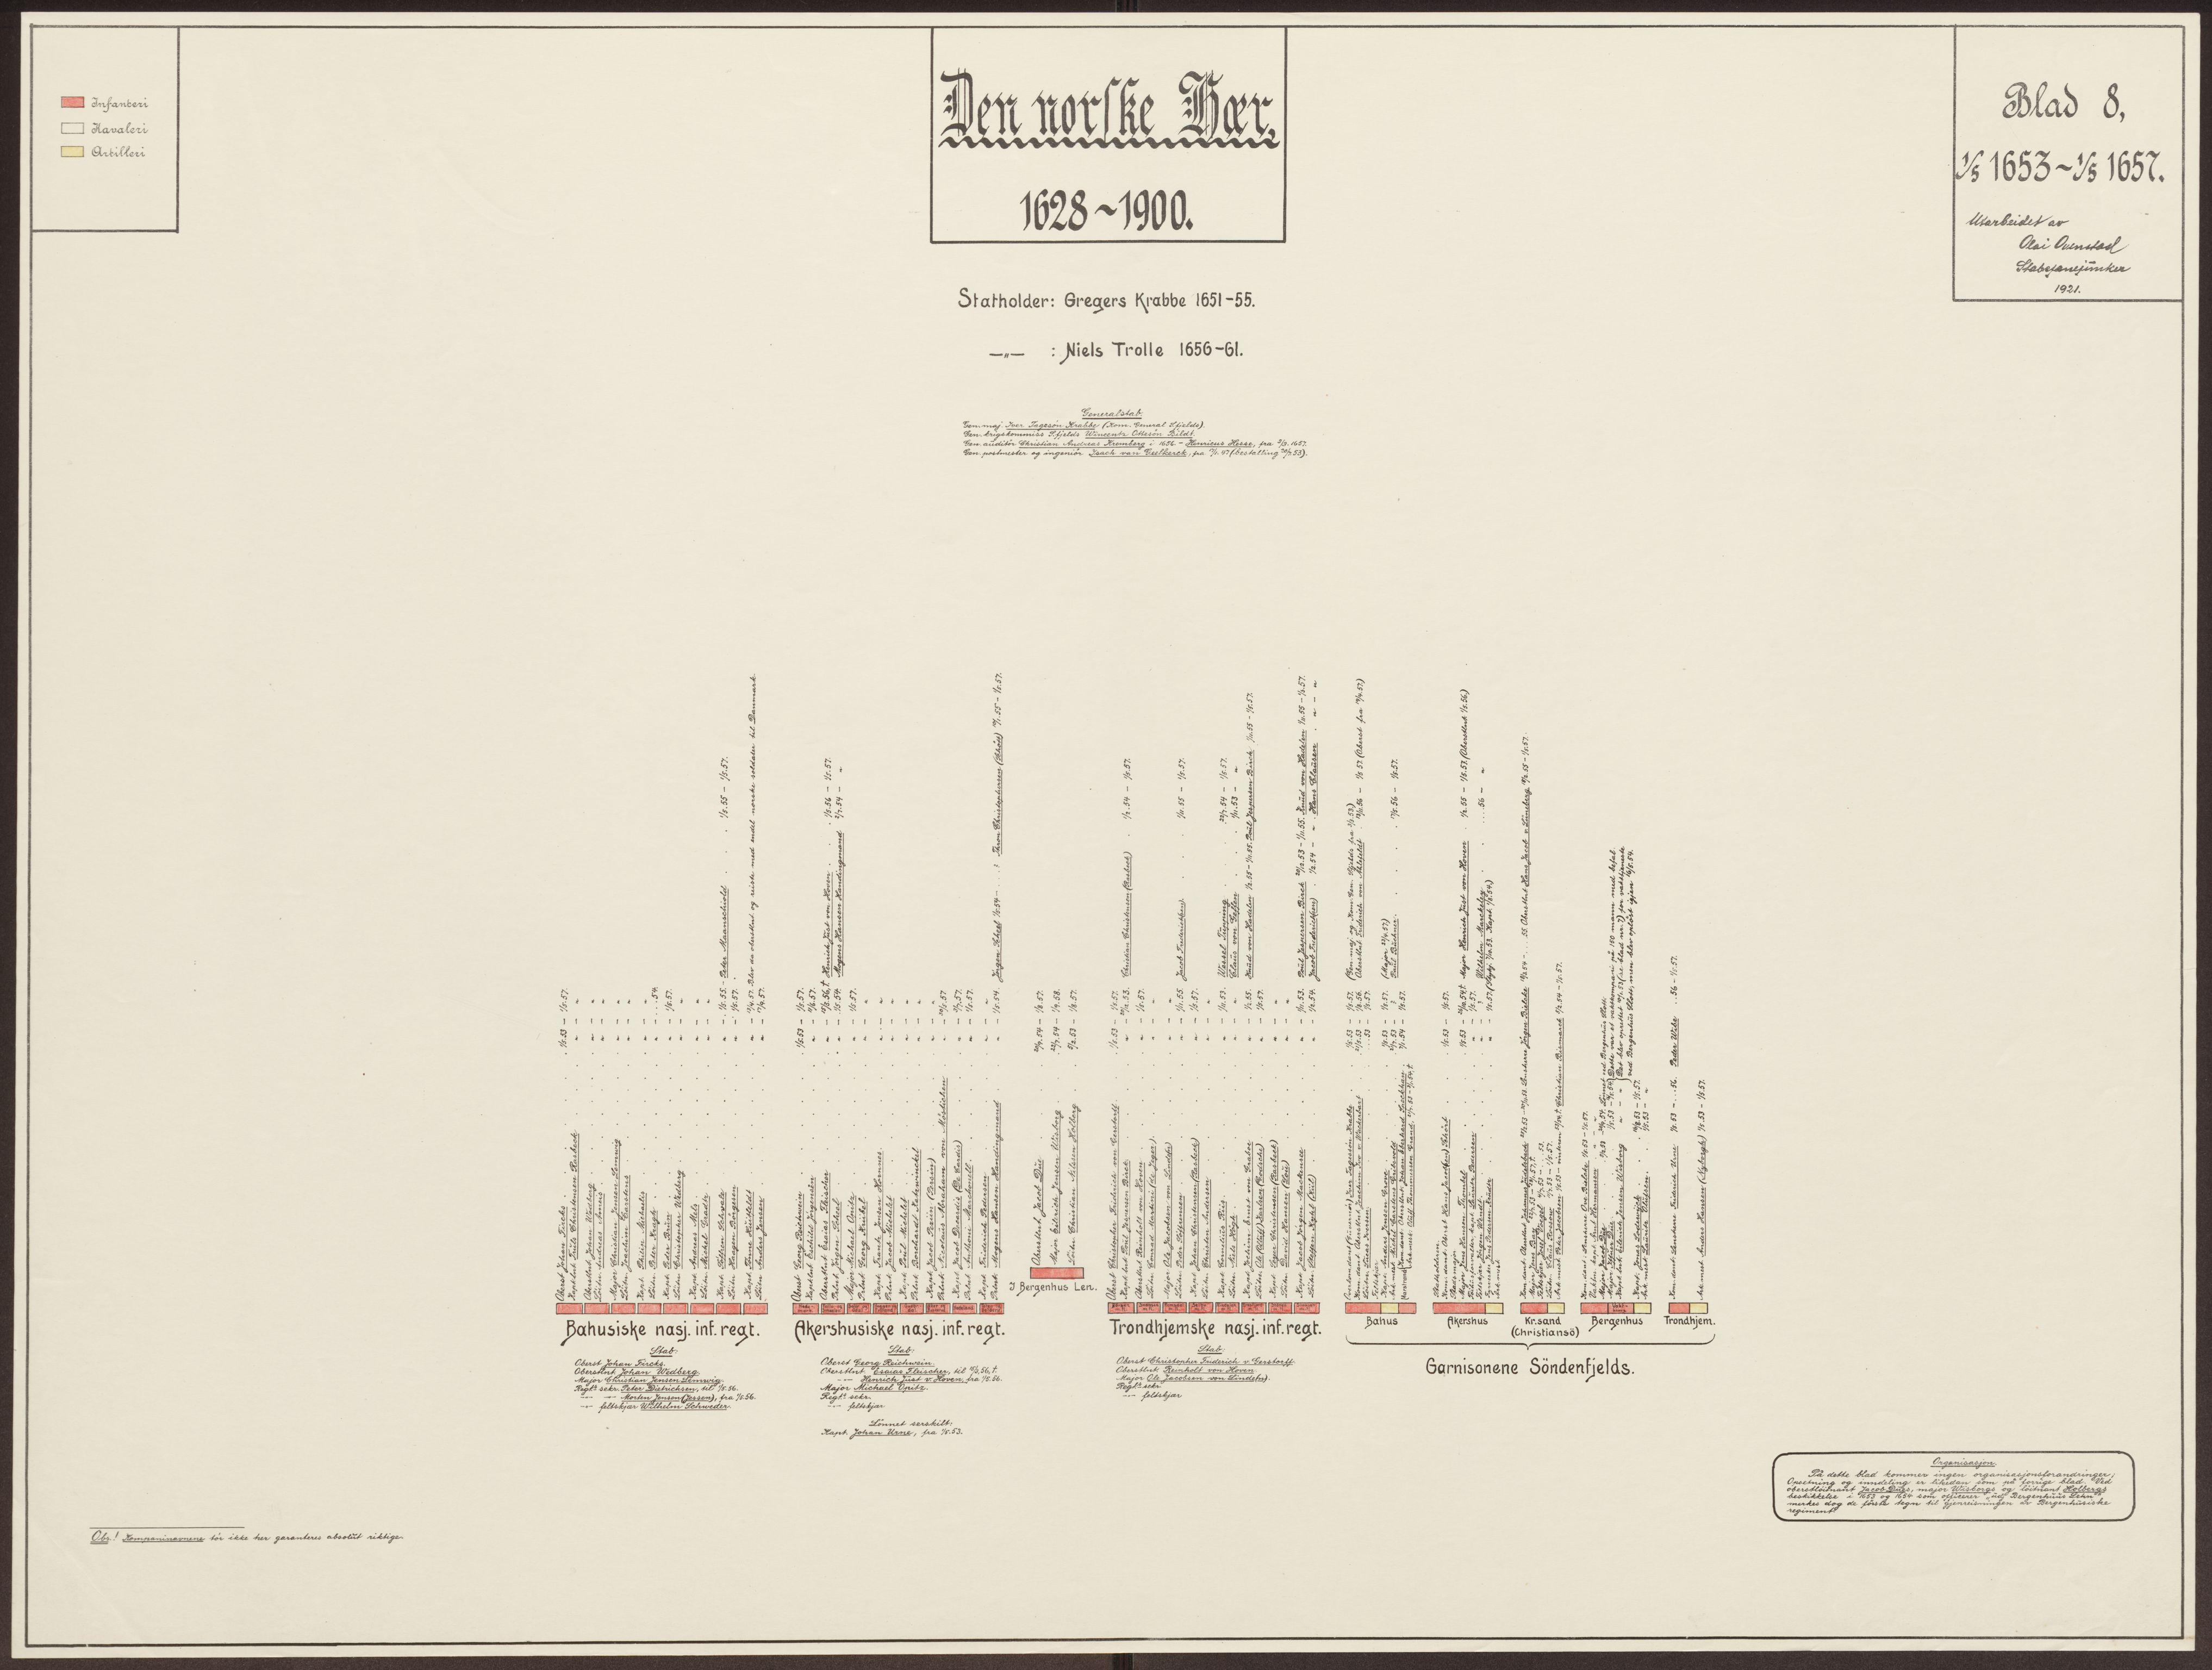 RA, Riksarkivets bibliotek, 1628-1818, s. 8